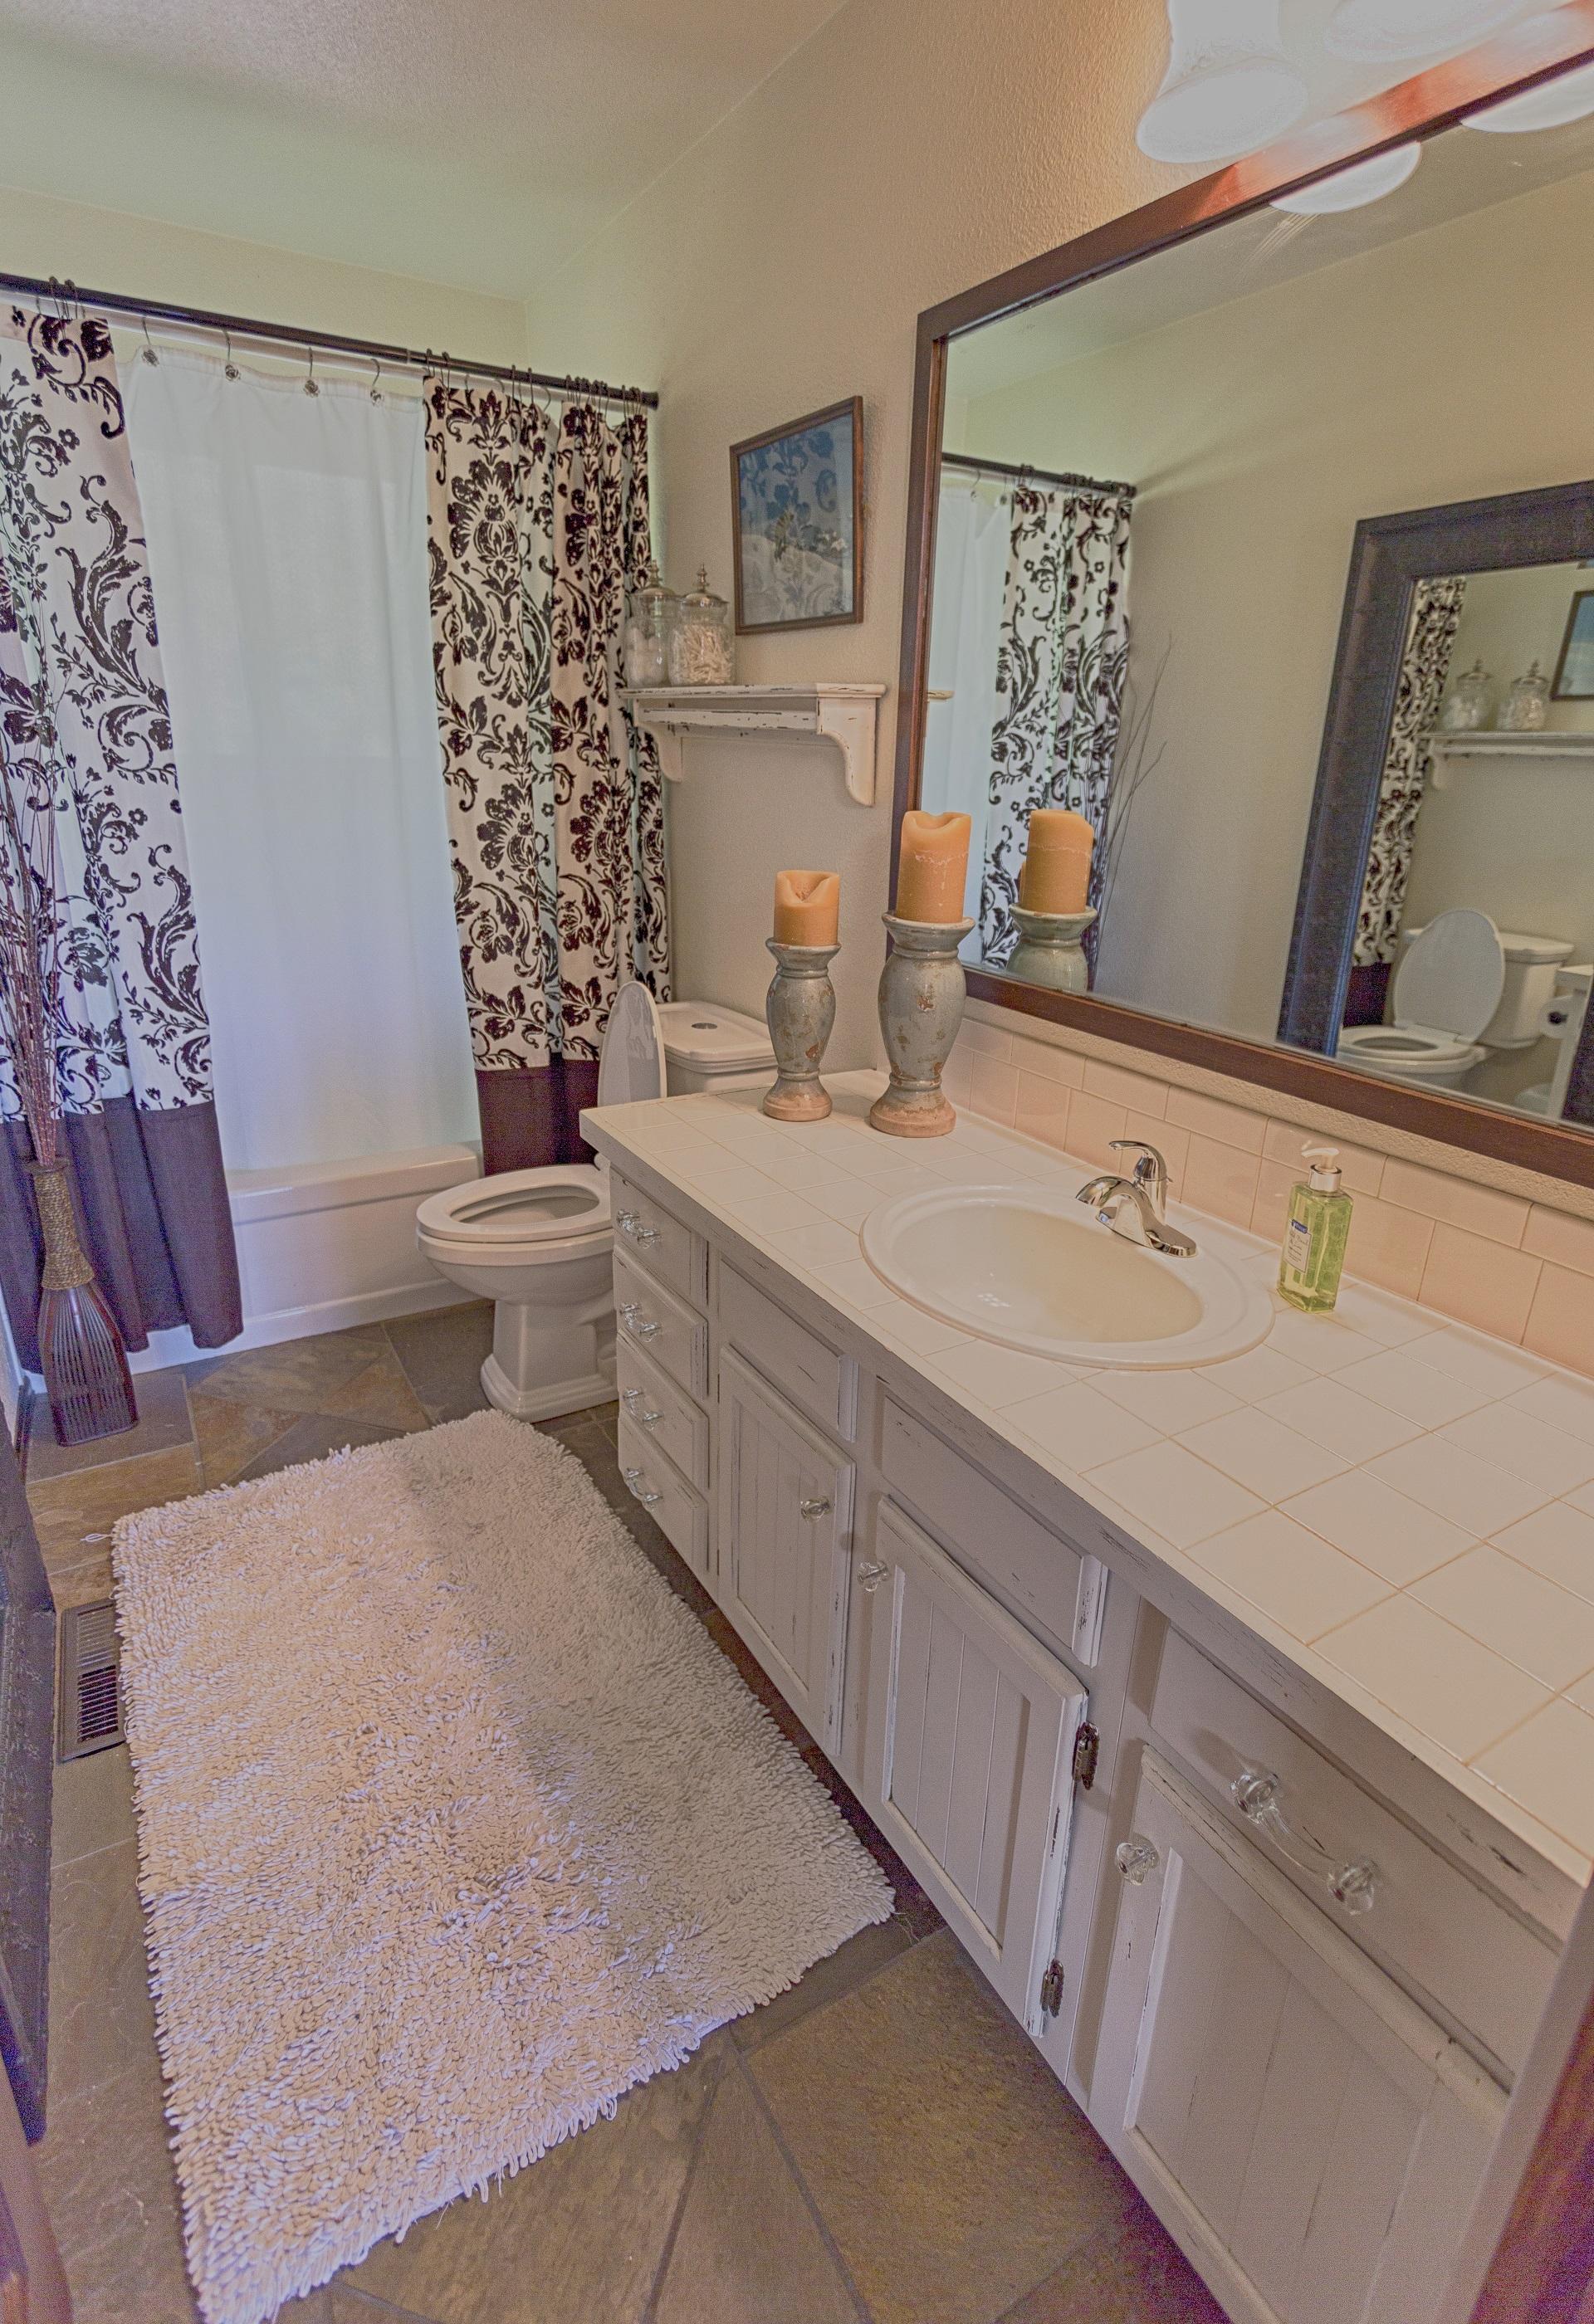 b6 Bathroom #1 small